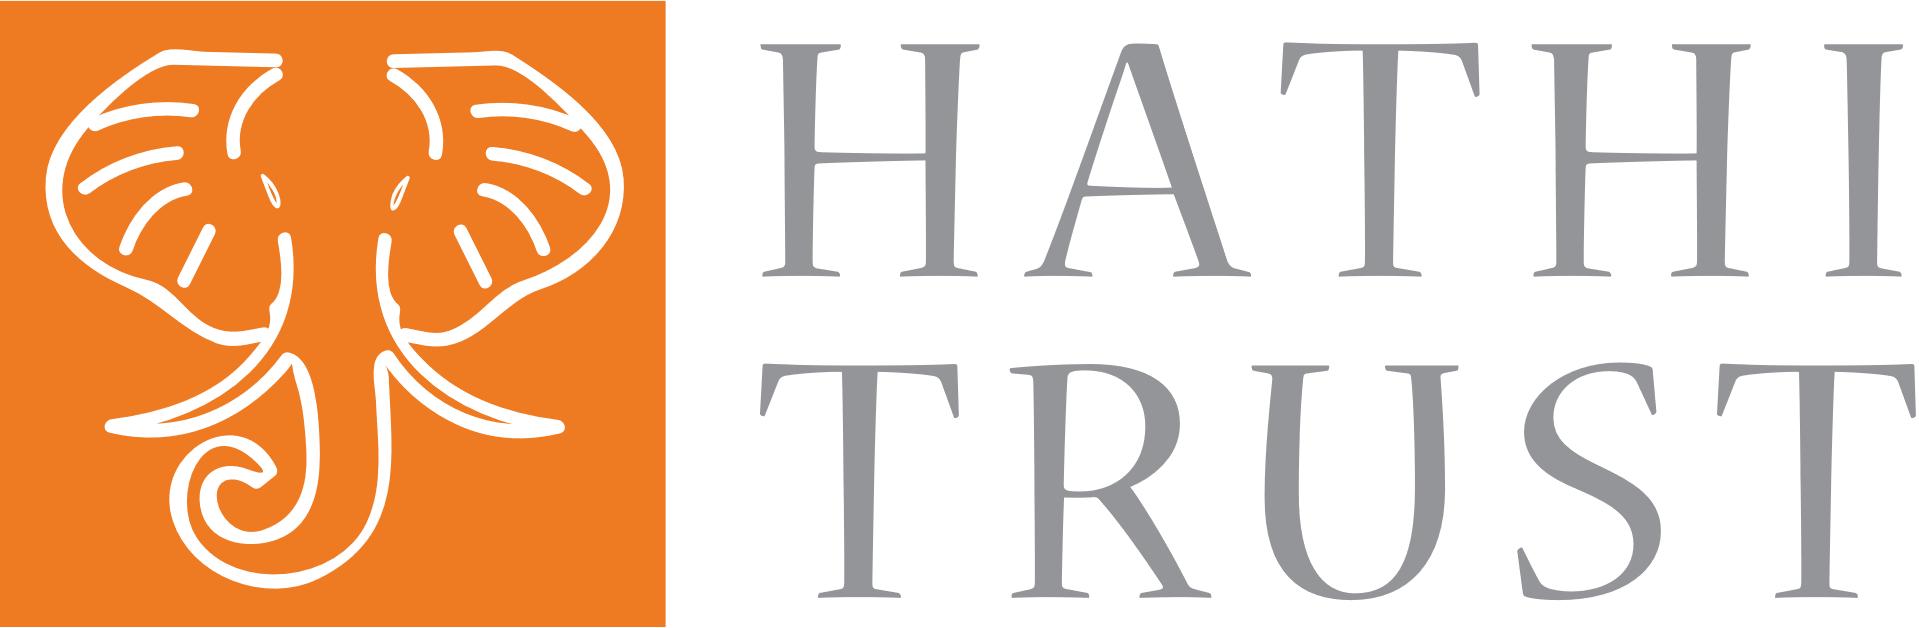 HathiTrust Logo